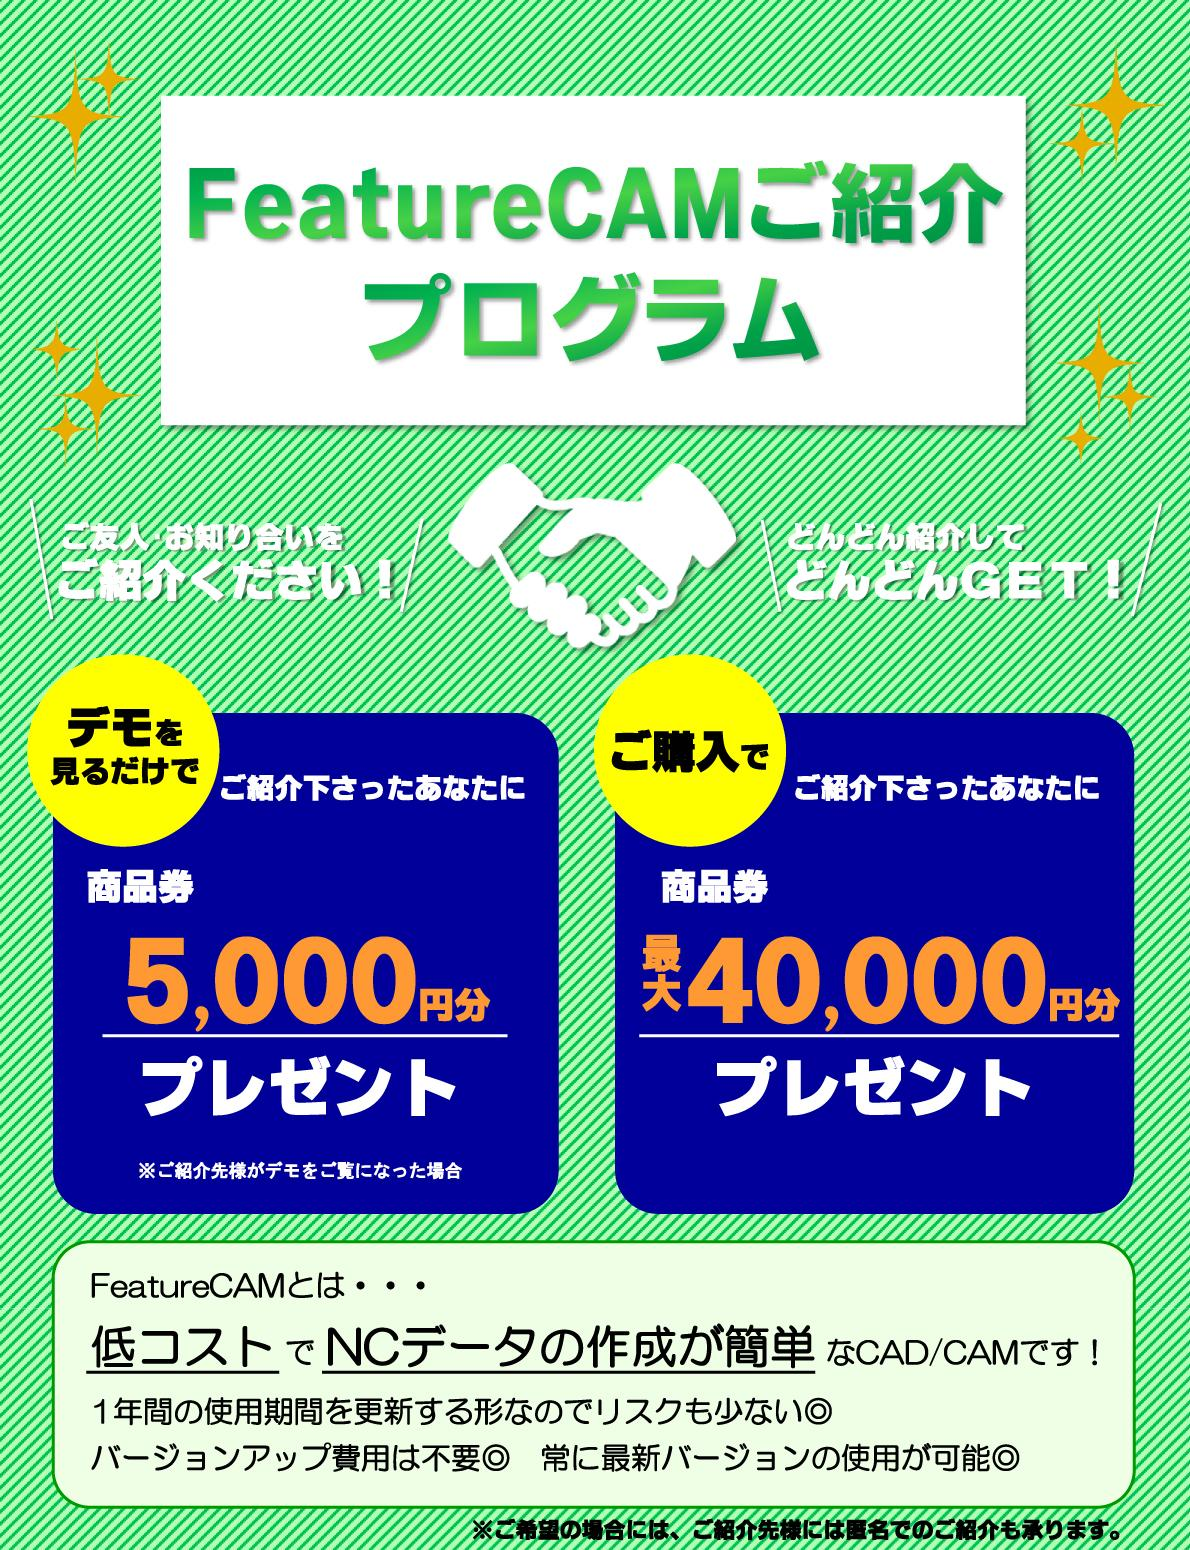 syokai_PG2.jpg